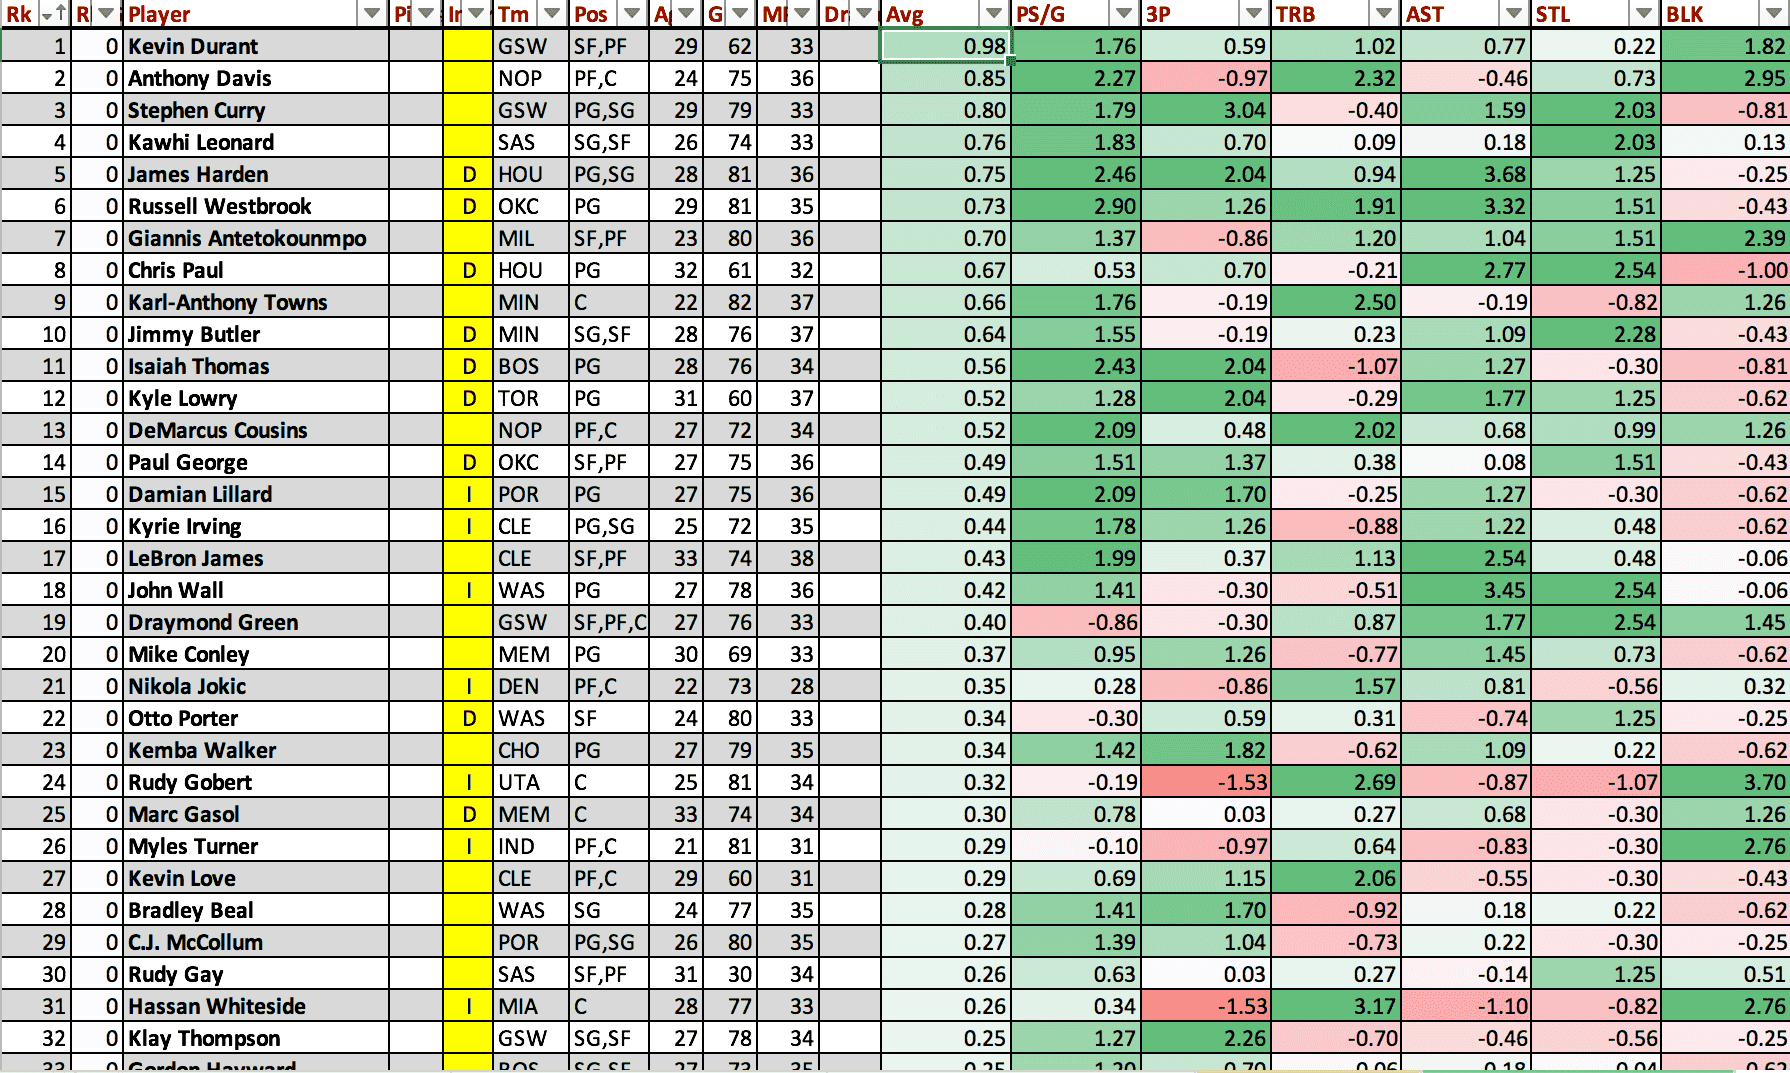 Graph of fantasy basketball analytics.